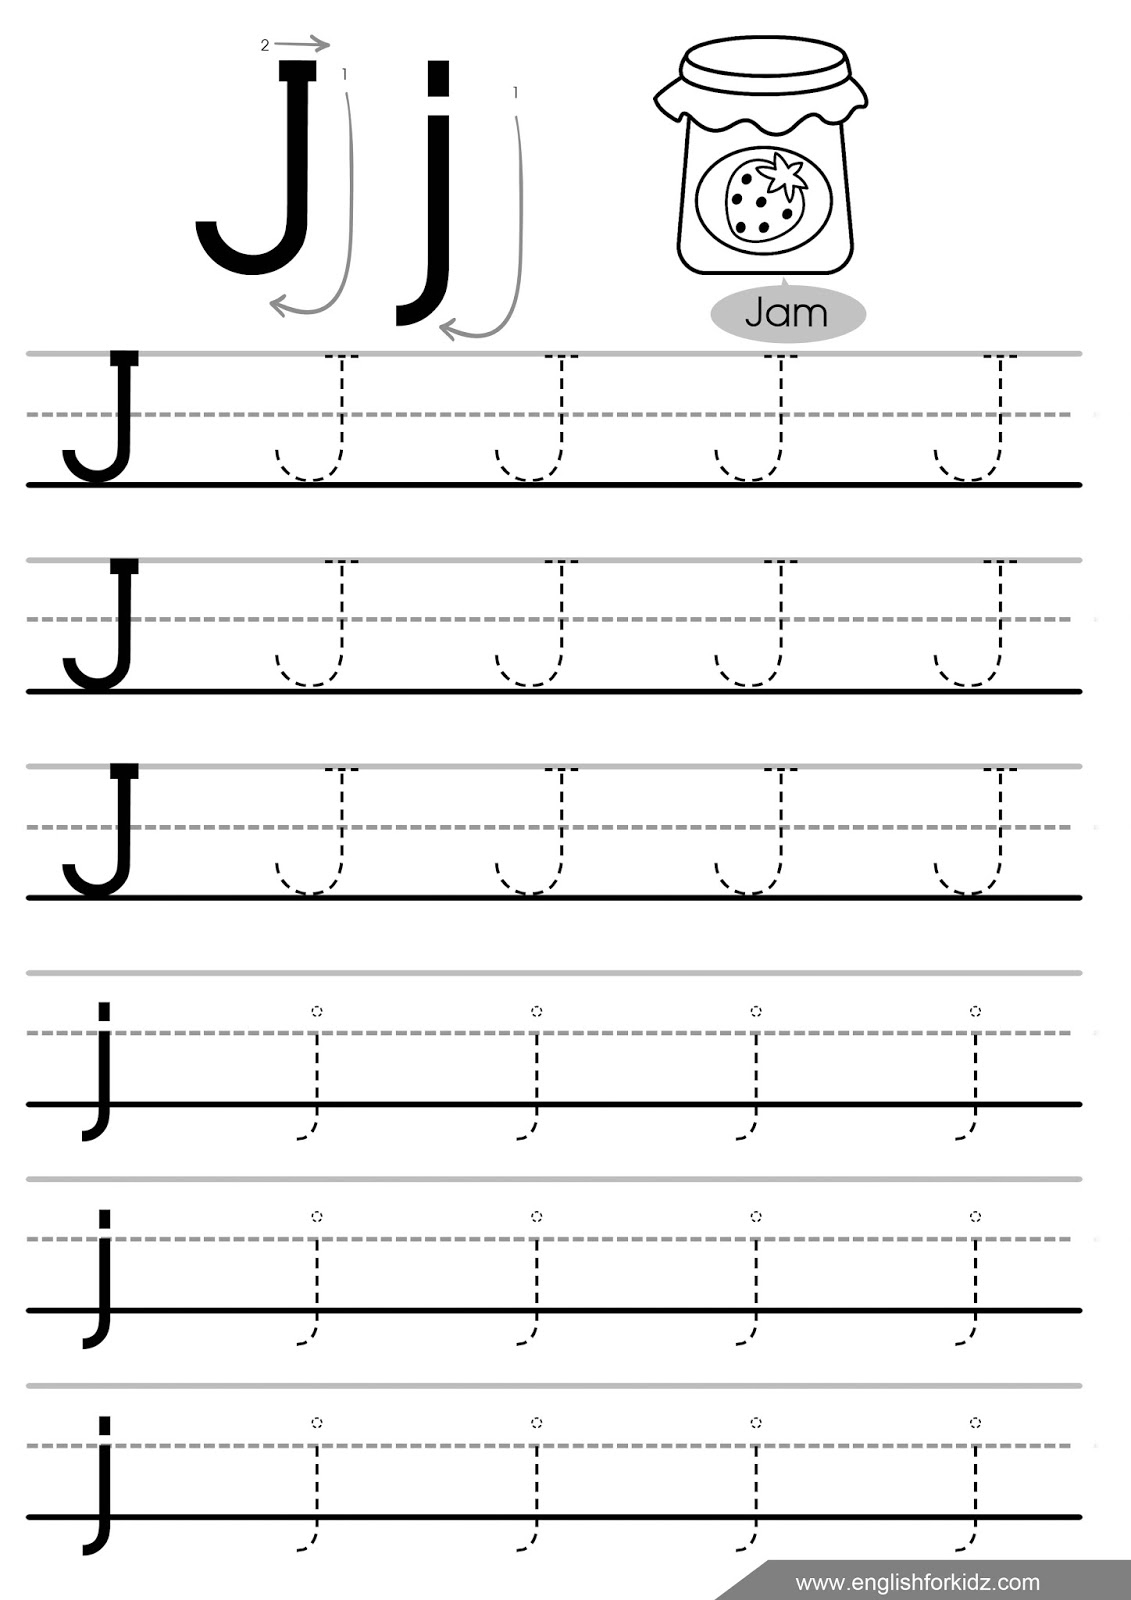 Letter J Worksheets, Flash Cards, Coloring Pages within Letter J Worksheets Free